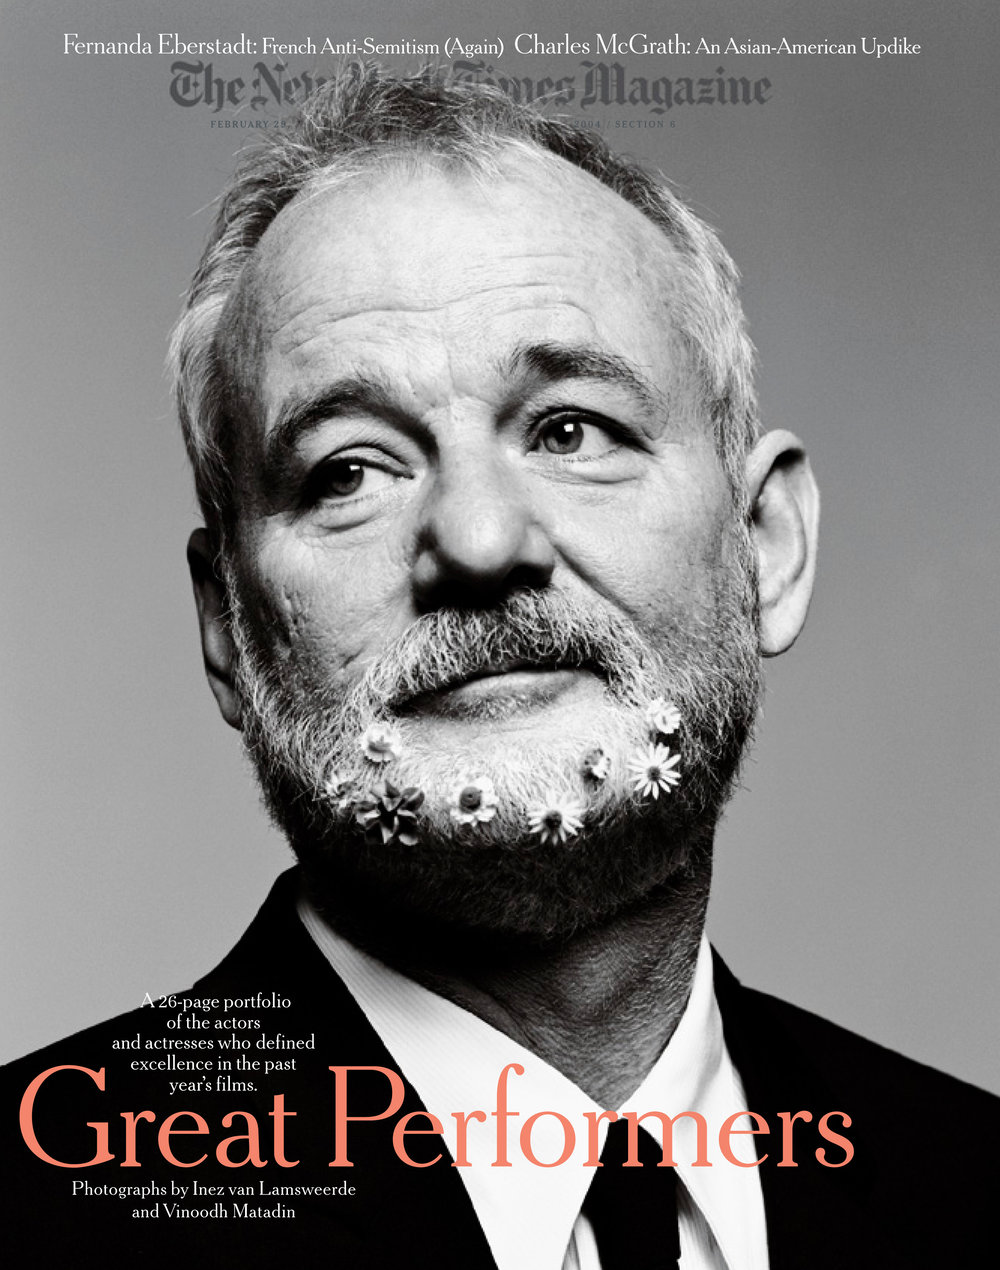 COVER.02.29.04.Oscars-Bill Murray-Cover.jpg